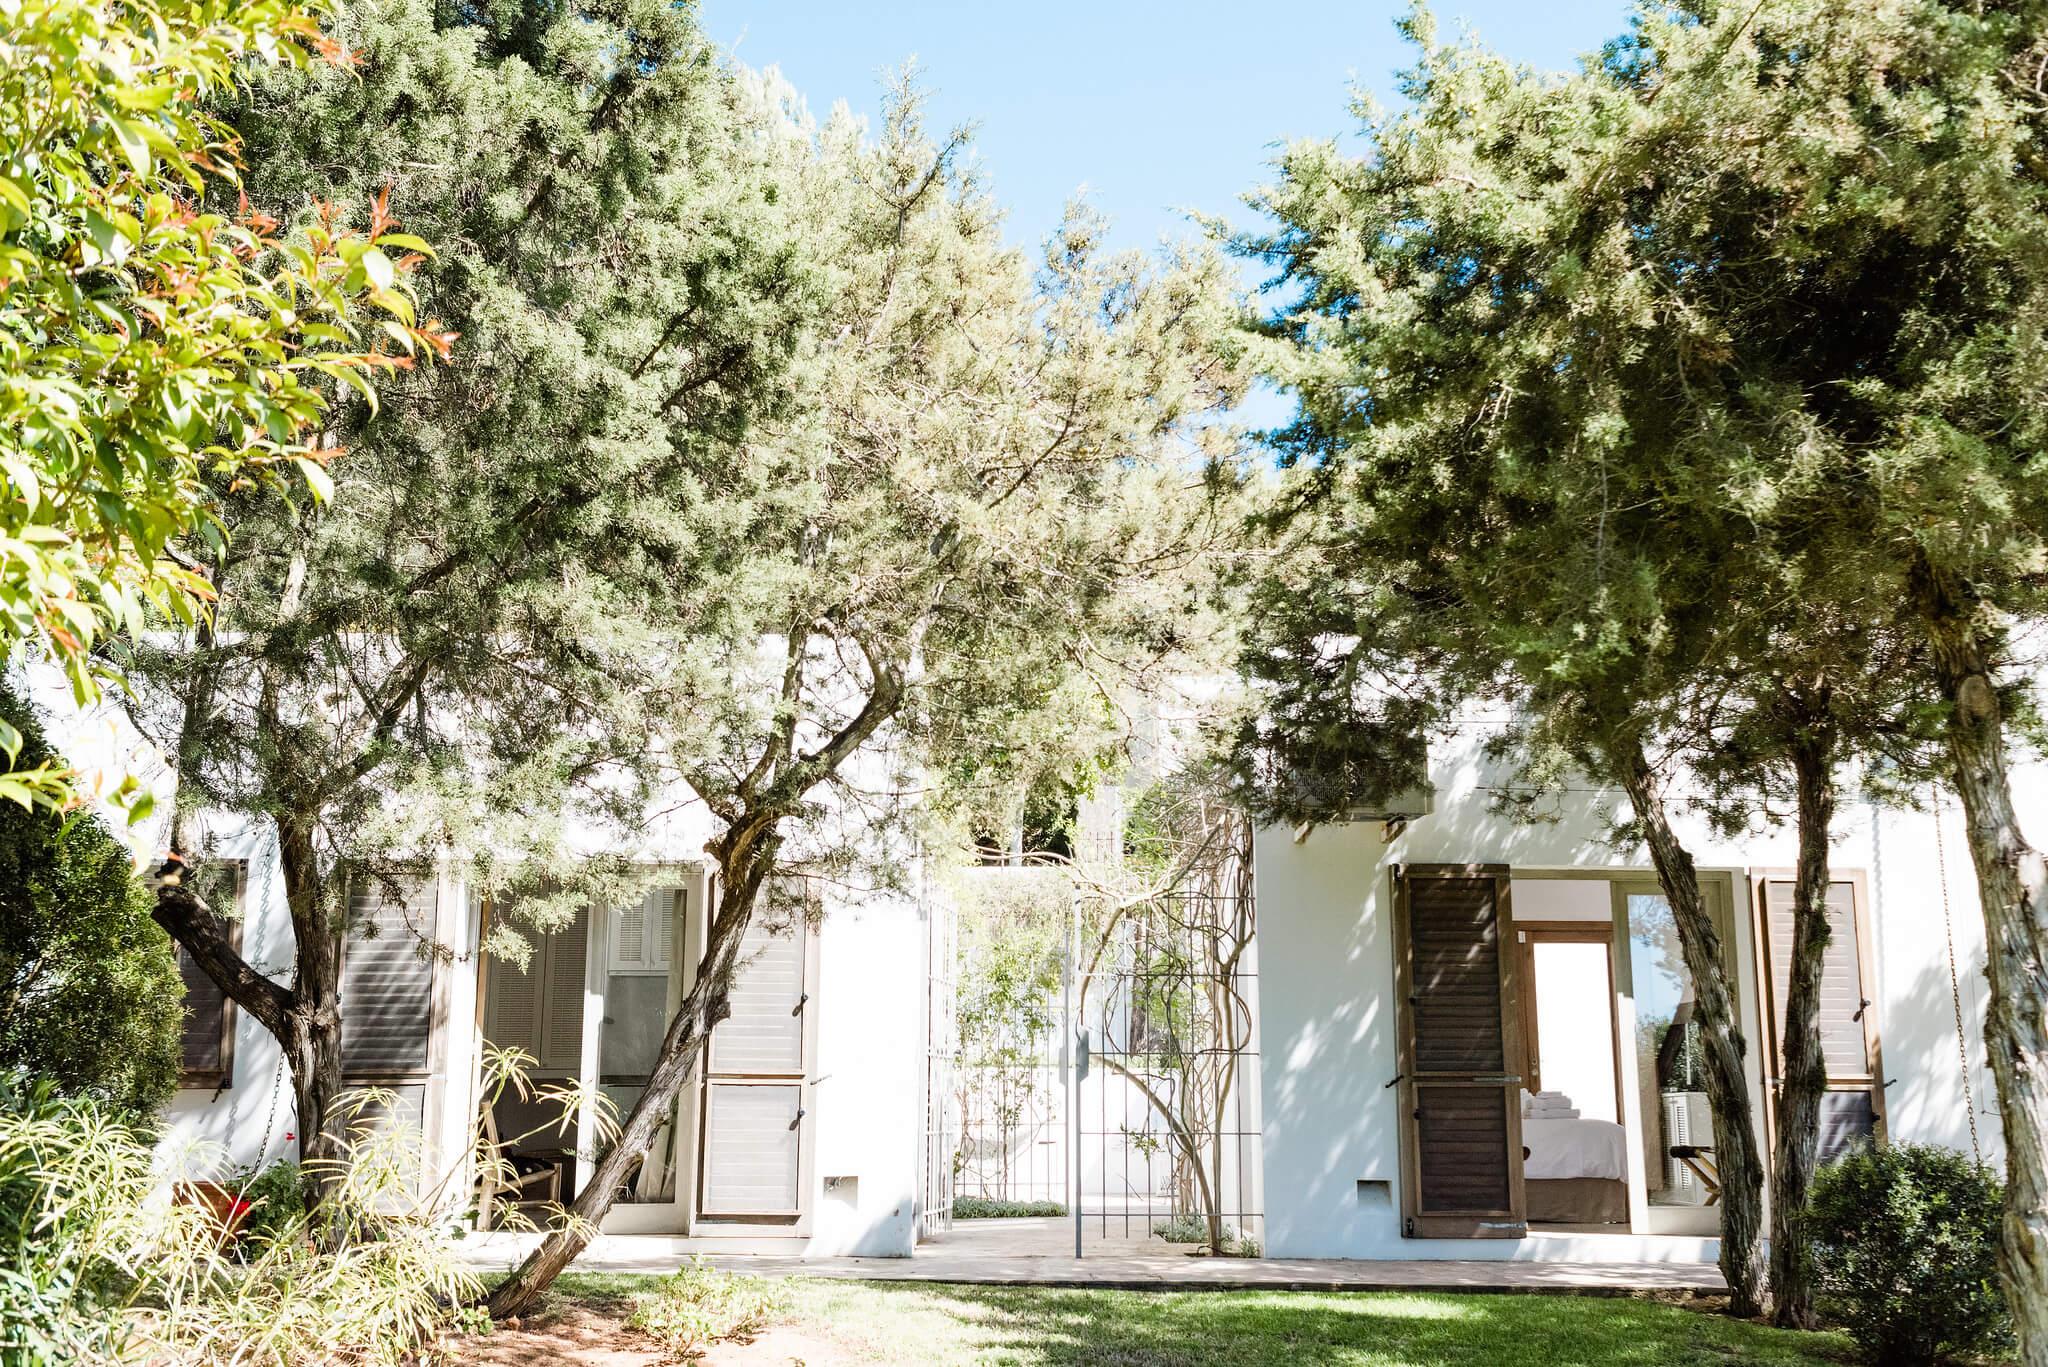 https://www.white-ibiza.com/wp-content/uploads/2020/06/white-ibiza-villas-casa-nyah-exterior-garden-view.jpg